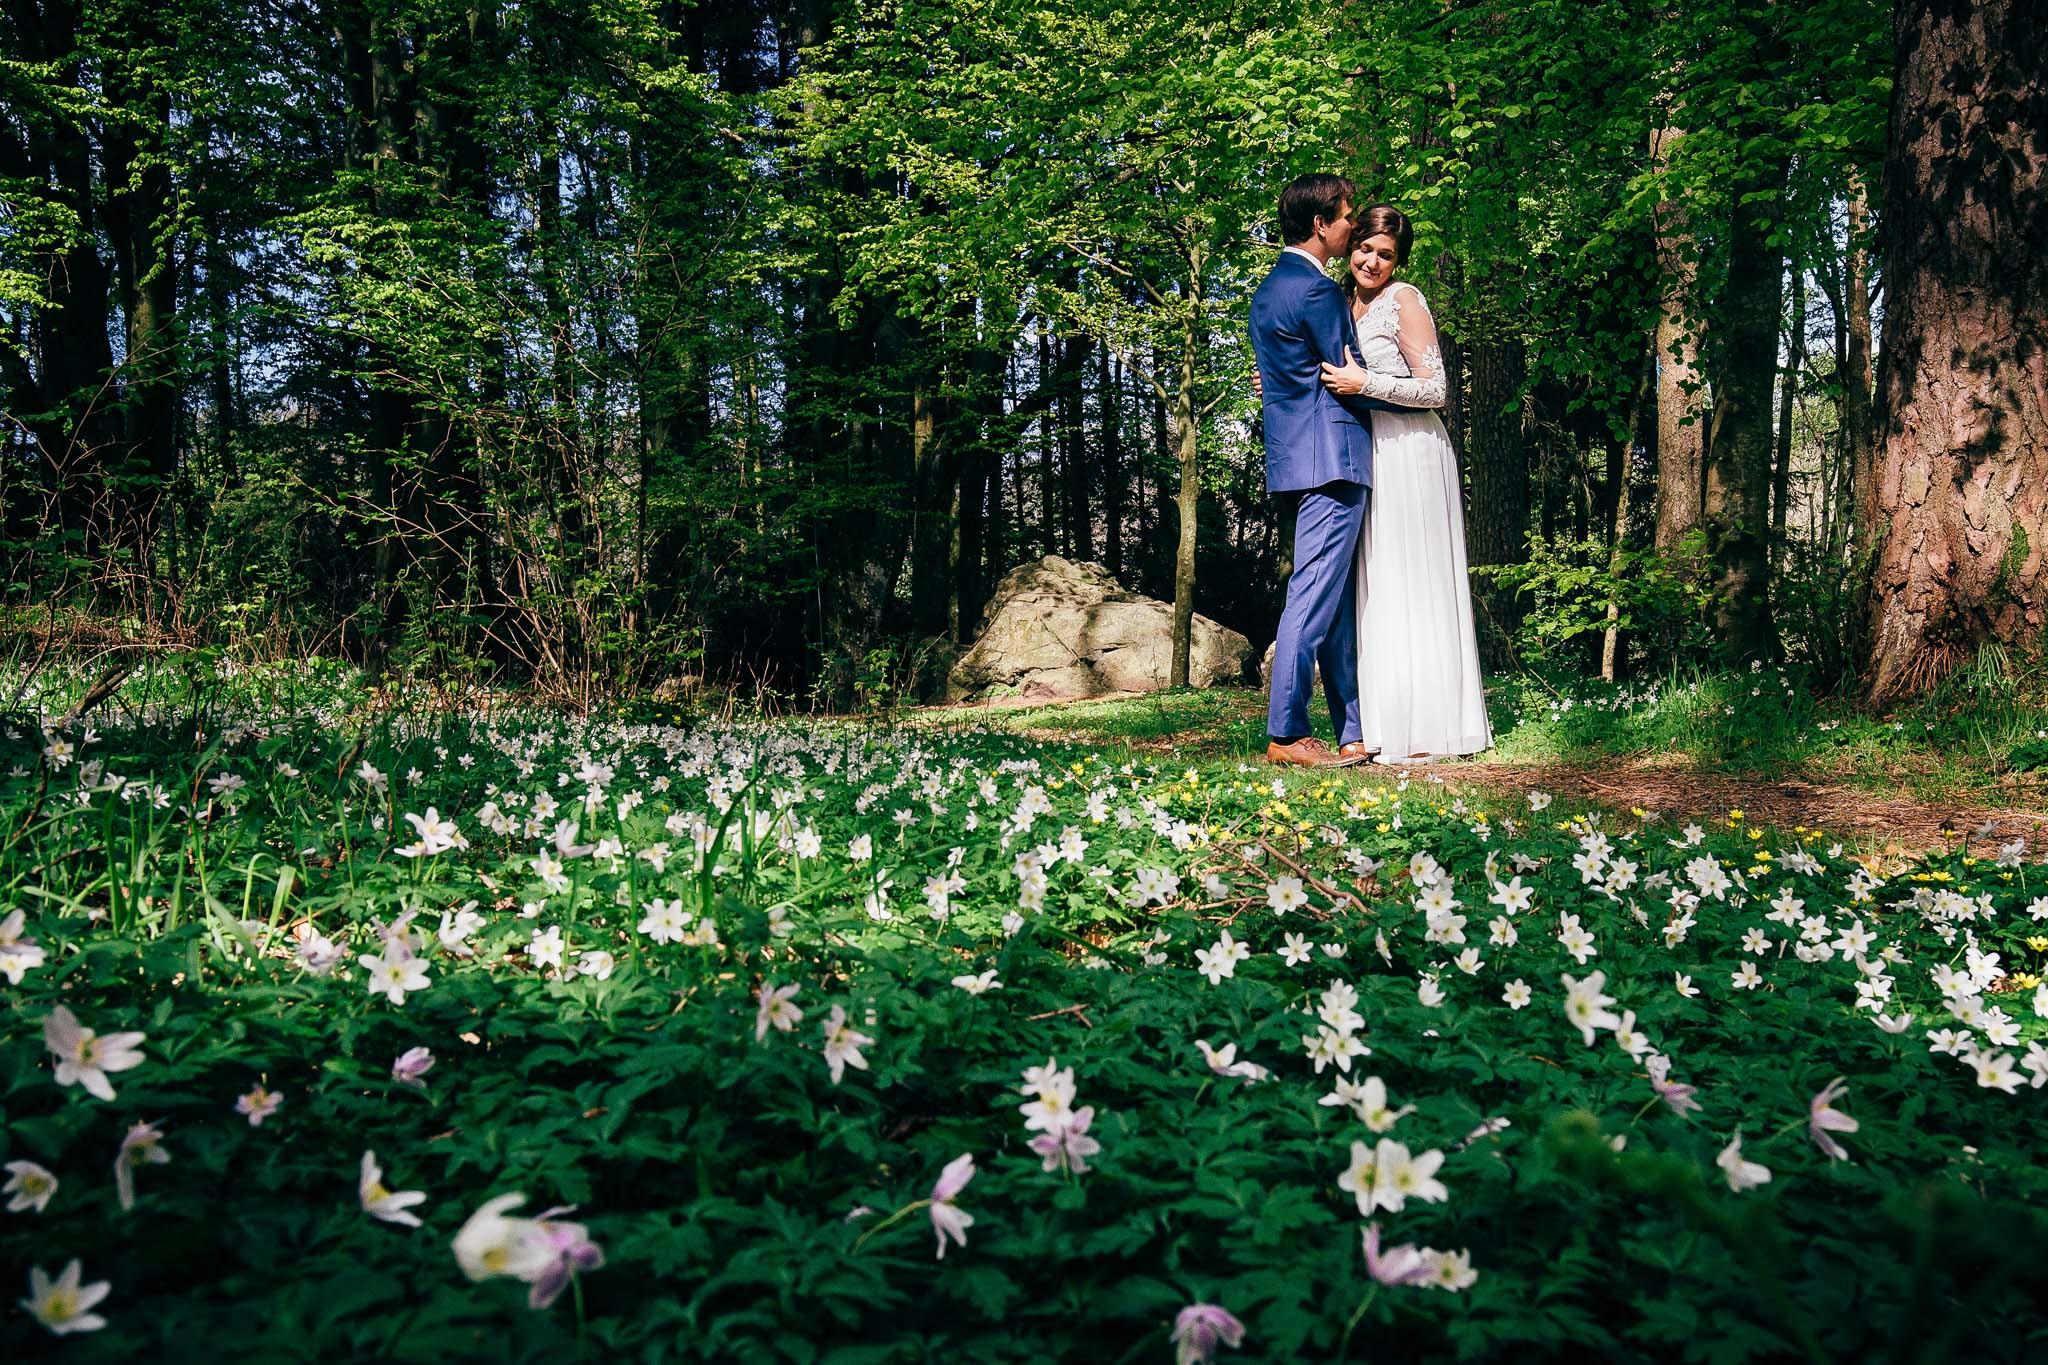 Wedding+Photographer+Norway+Bryllupsfotograf+Casey+Arneson+-106.jpg